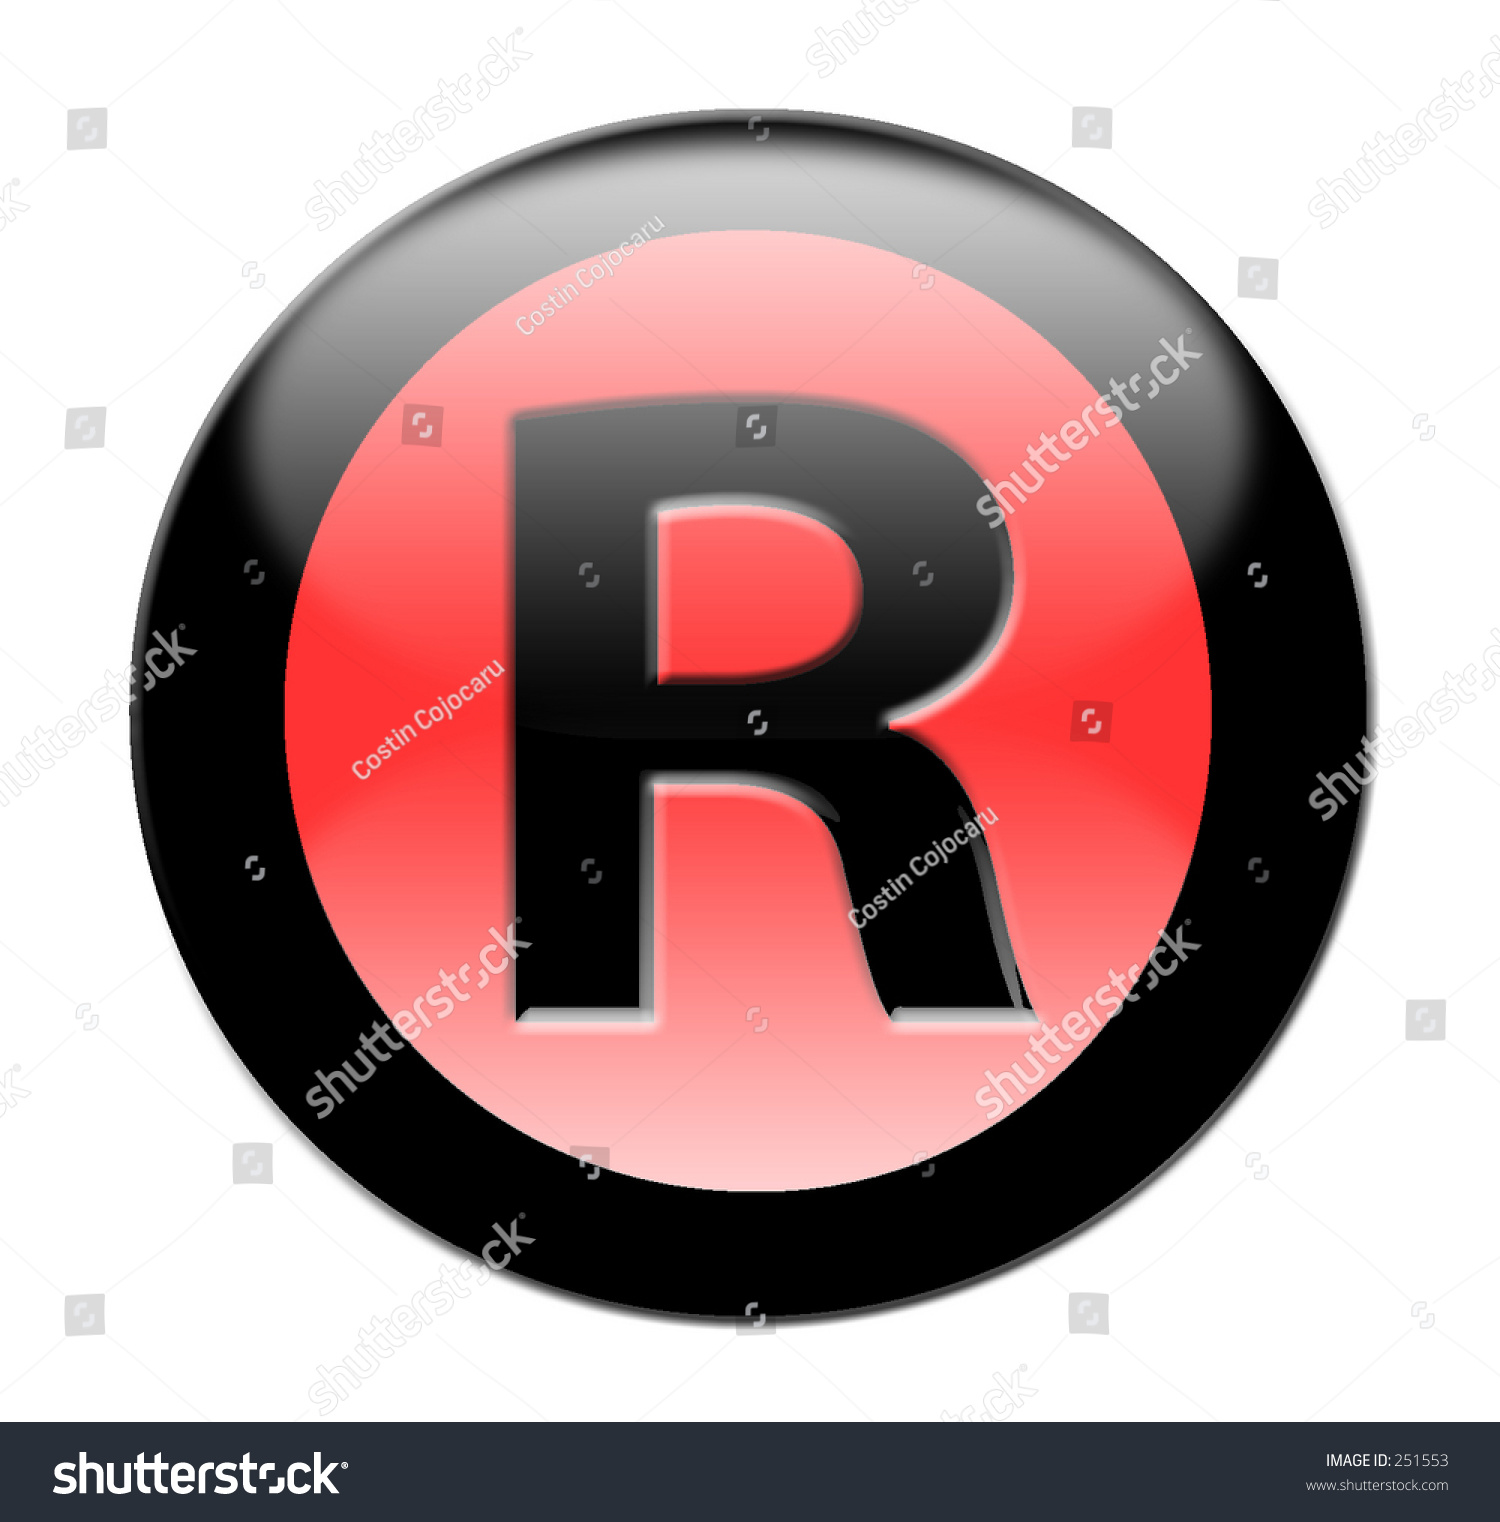 Registered symbol stock photo 251553 shutterstock registered symbol buycottarizona Gallery